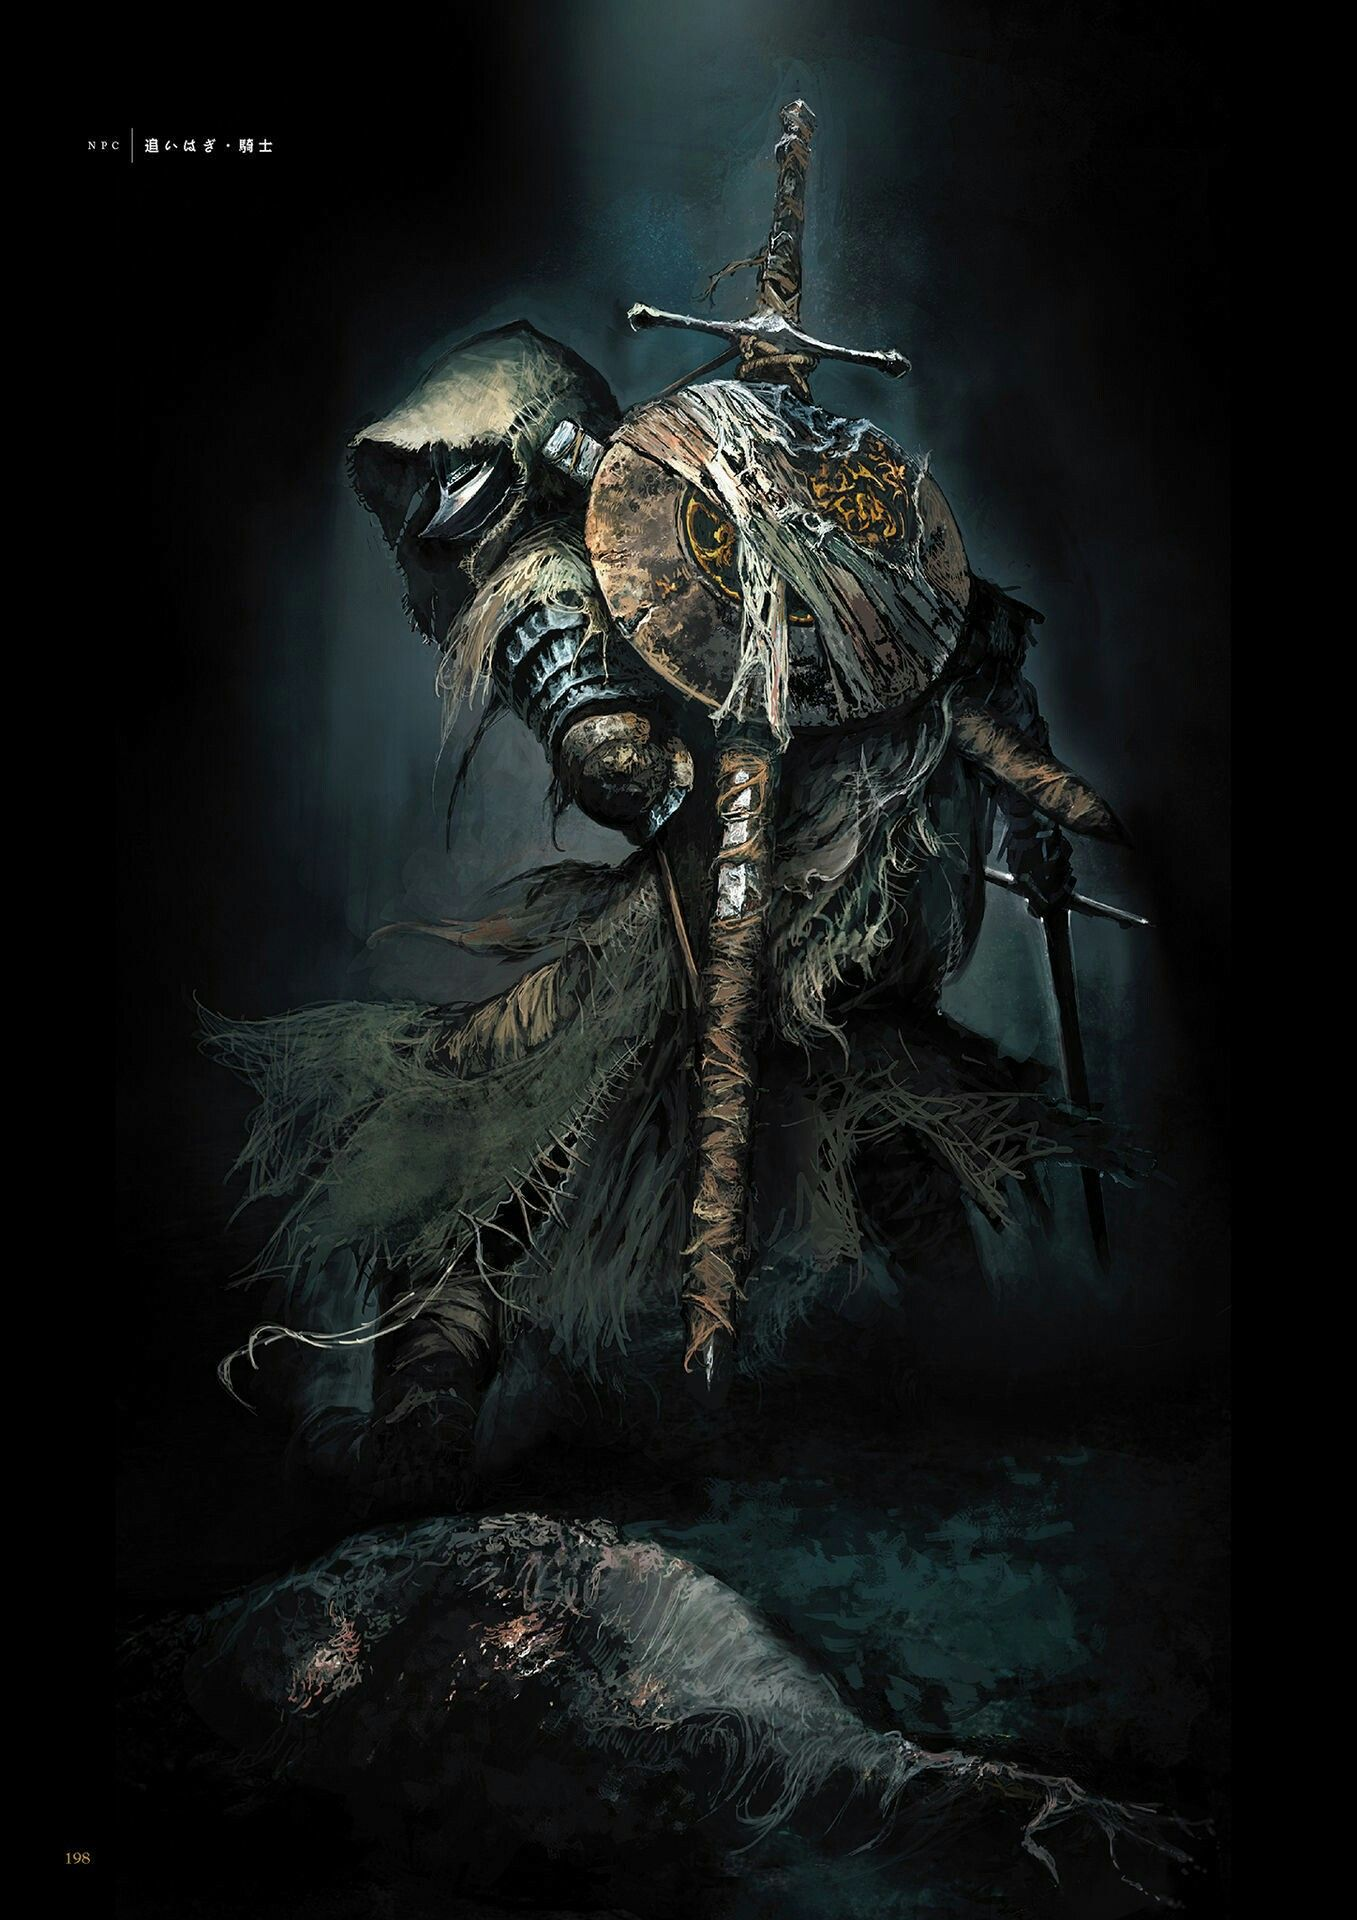 Dark Souls 3 Concept Art Greirat Concept Art Harcosok